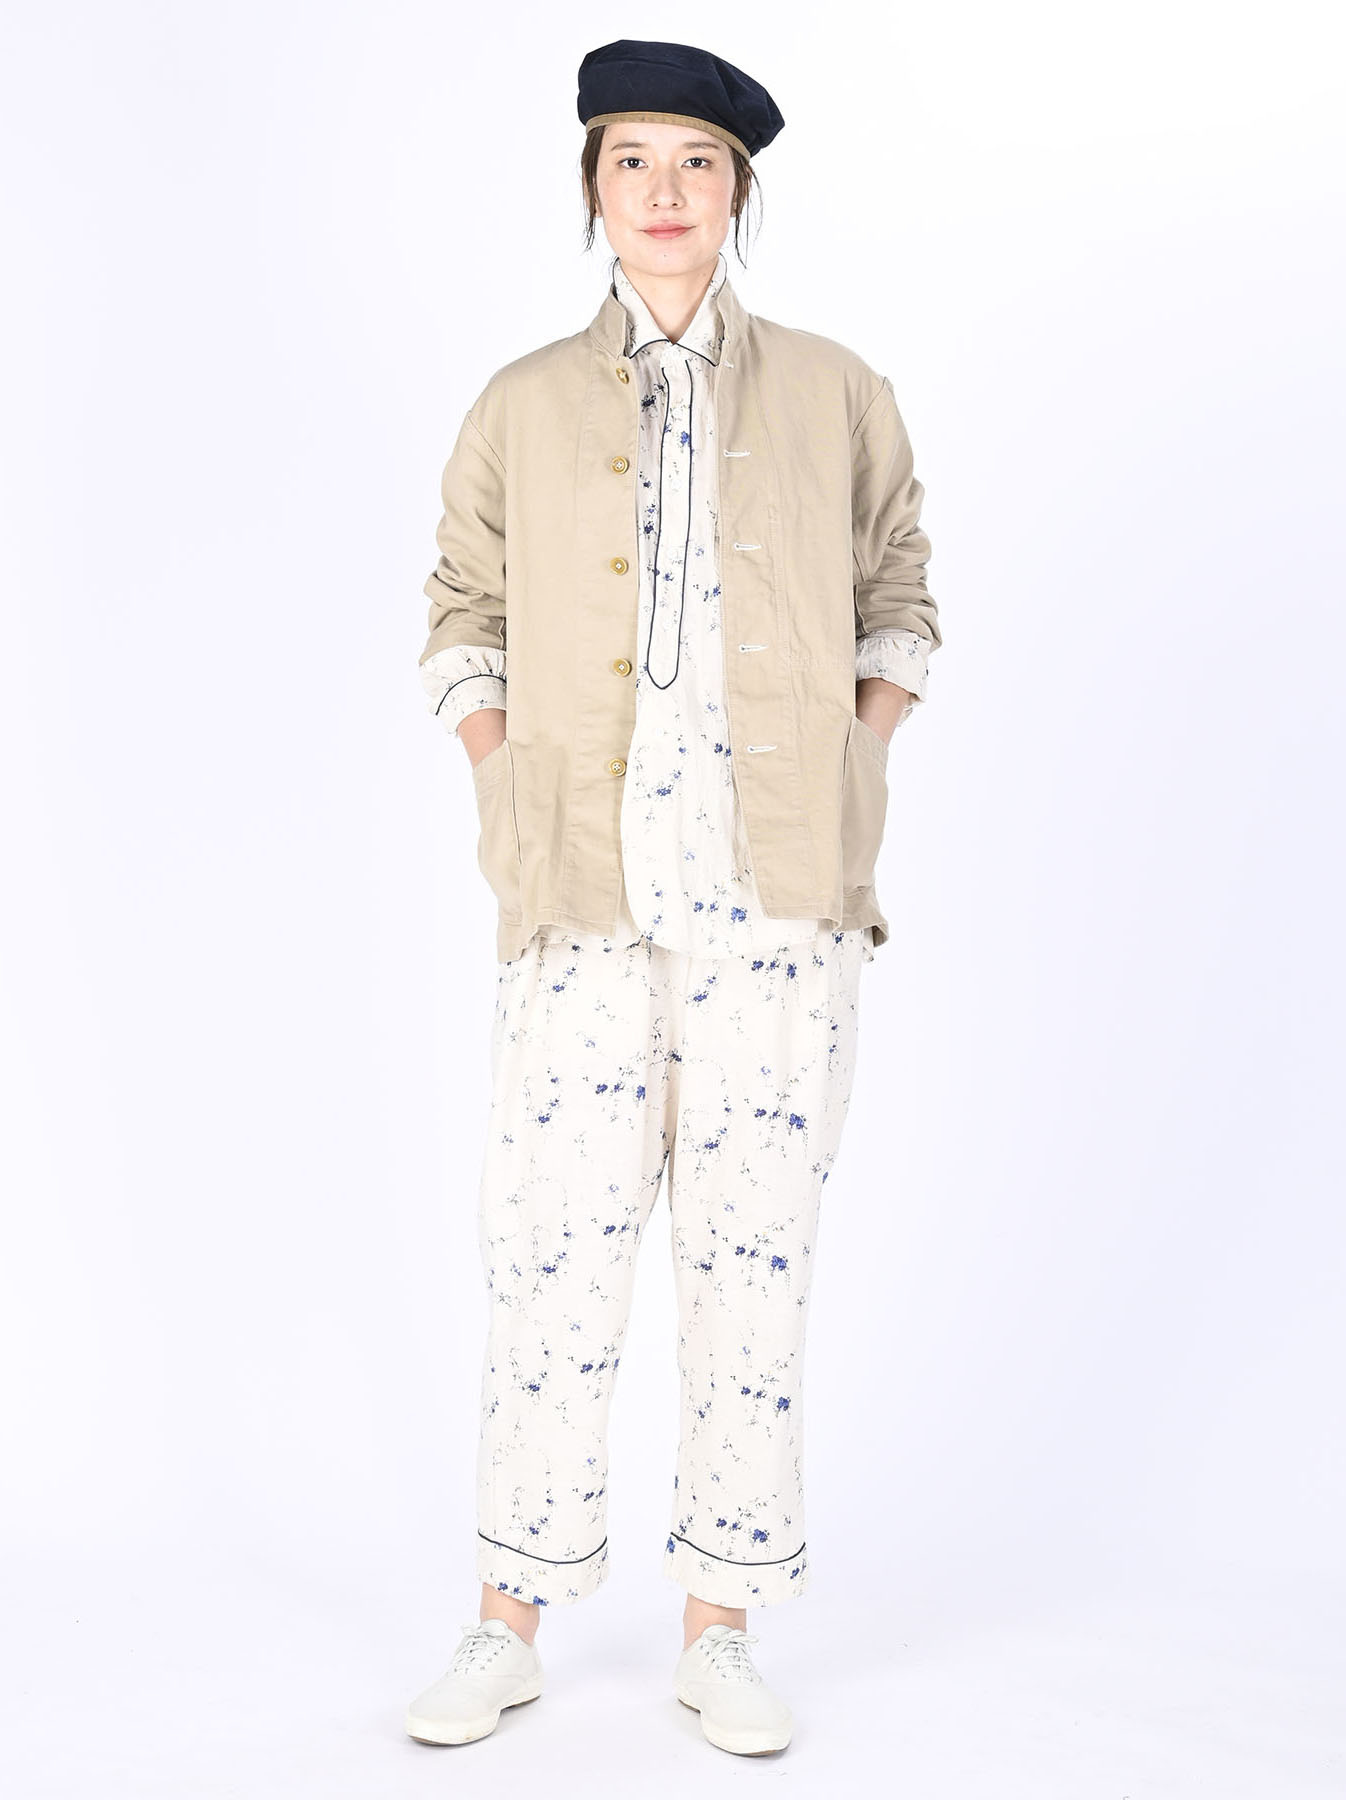 Okome Chino 908 Shirt Jacket-2